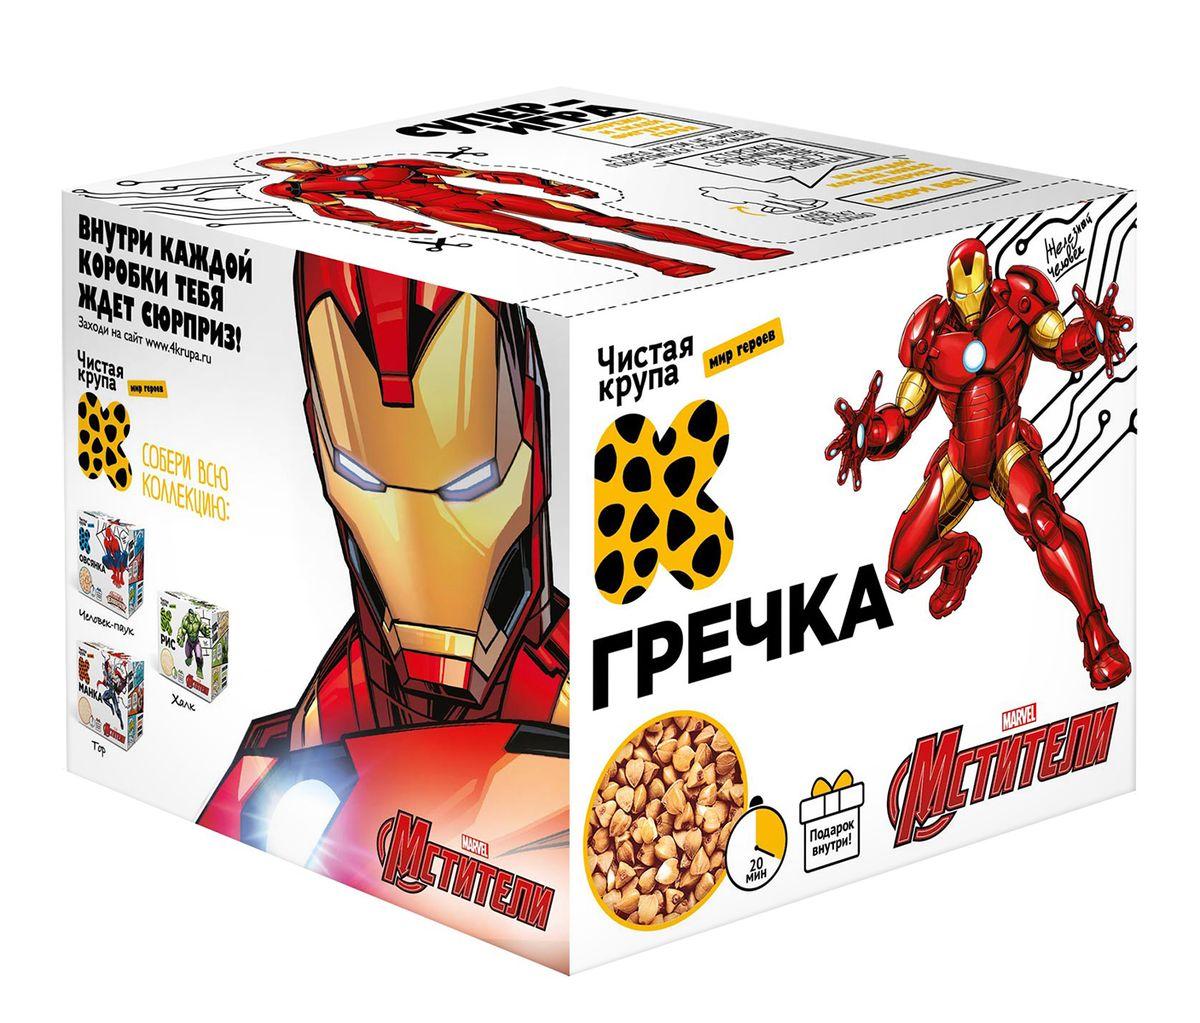 Чистая Крупа Marvel Мстители гречка ядрица крупа в пакетиках для варки с подарком, 5 шт по 60 г МКМ-КР-002